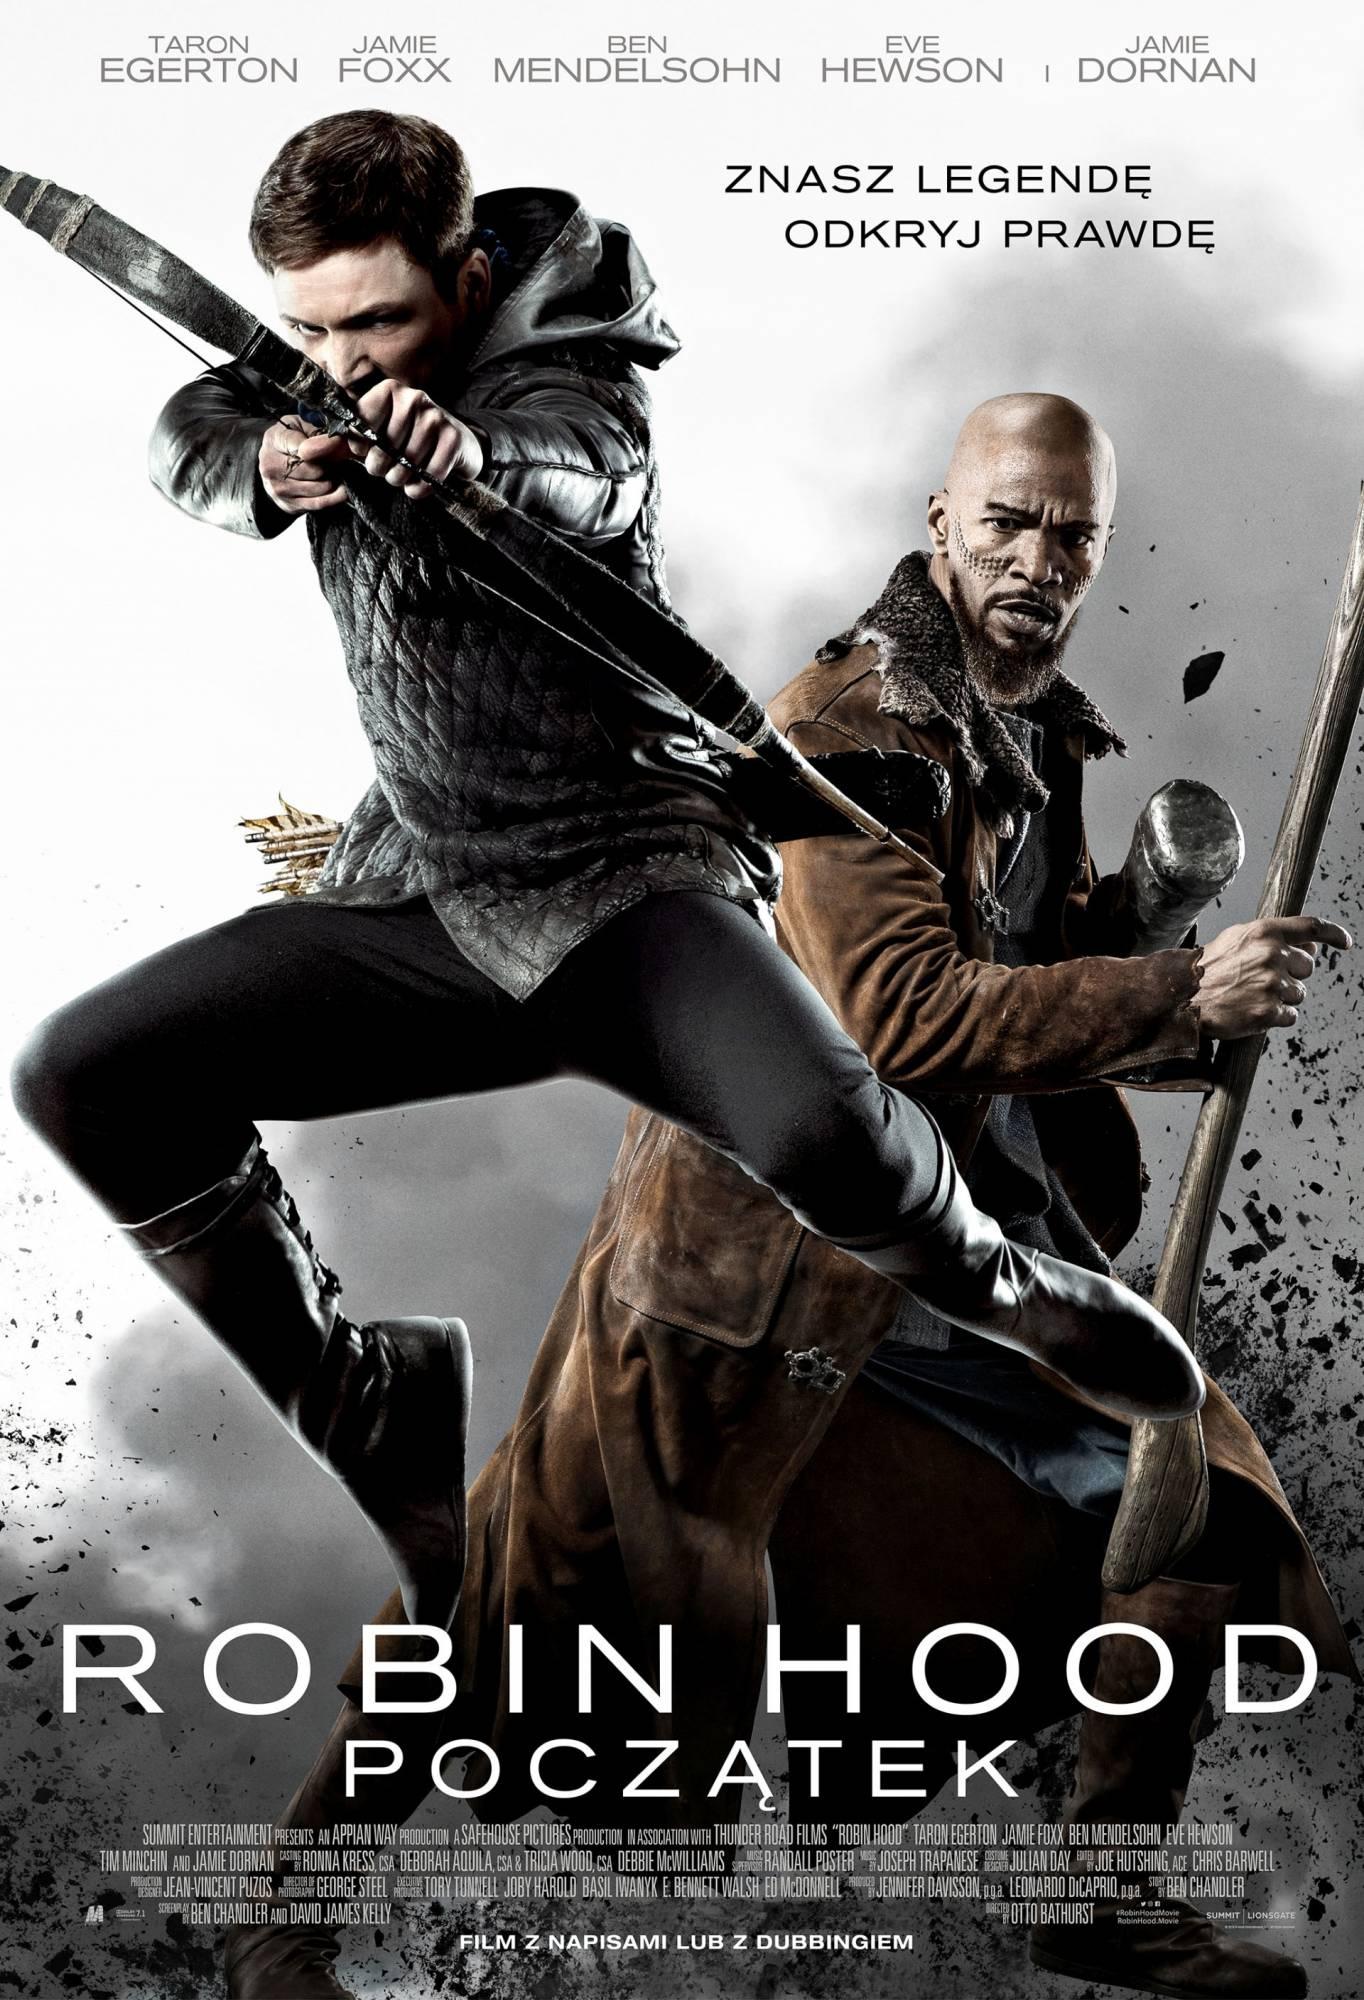 robin-hood-poczatek-plakat-01.jpg